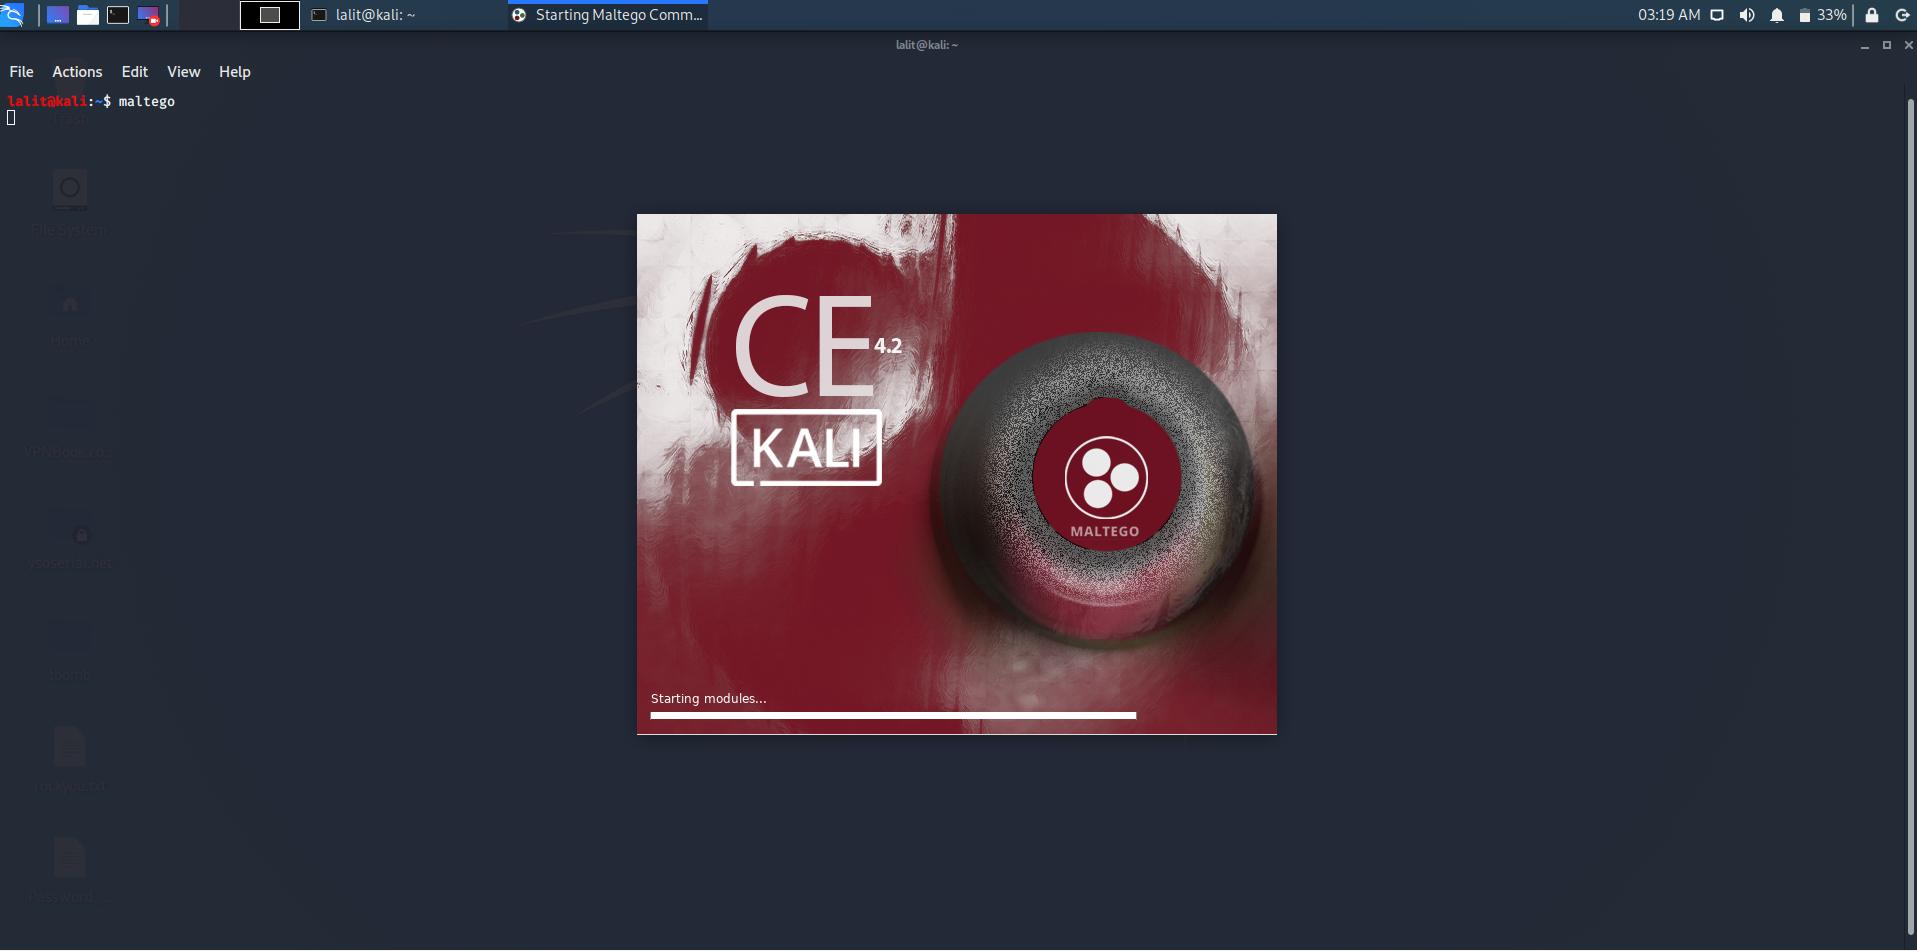 Maltego tool in kali linux